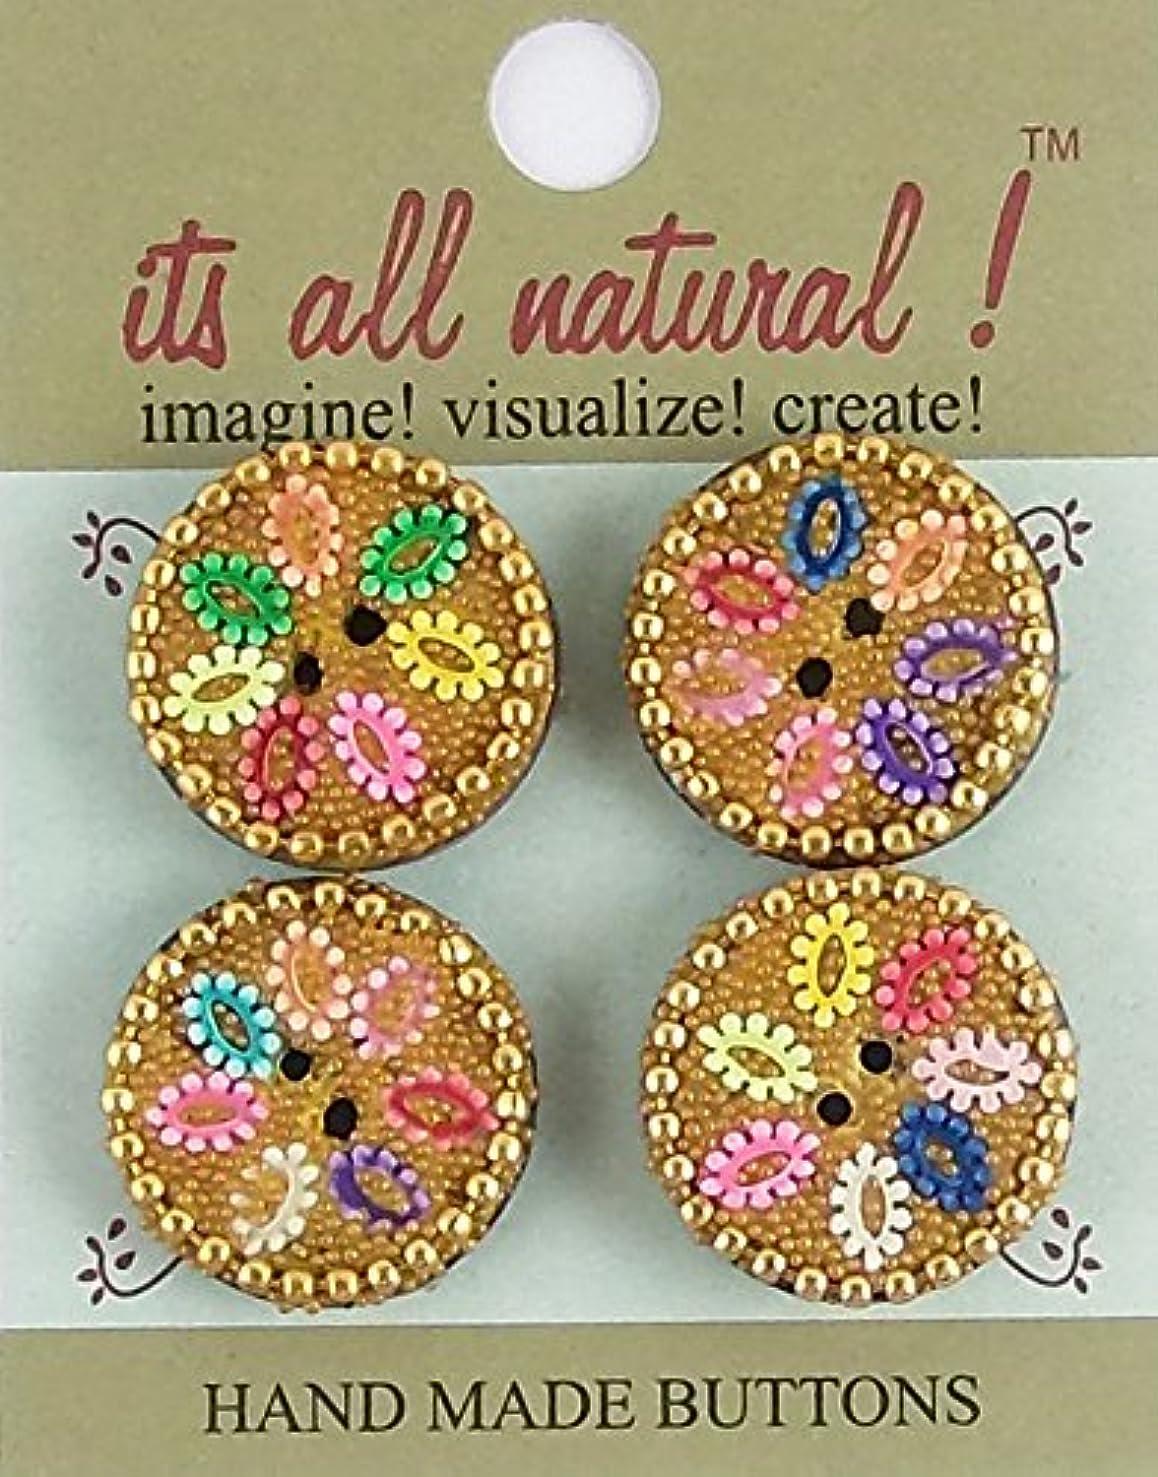 Handmade Natural Glass Cavier Buttons- Sewing Quilting Knitting Crochet Renaissance Dance Hawaiian Bridal Costumes Outfit Drapery- Multicolor- 25mm - Glass Caviar Beads Flower Design- 4 pcs/pk